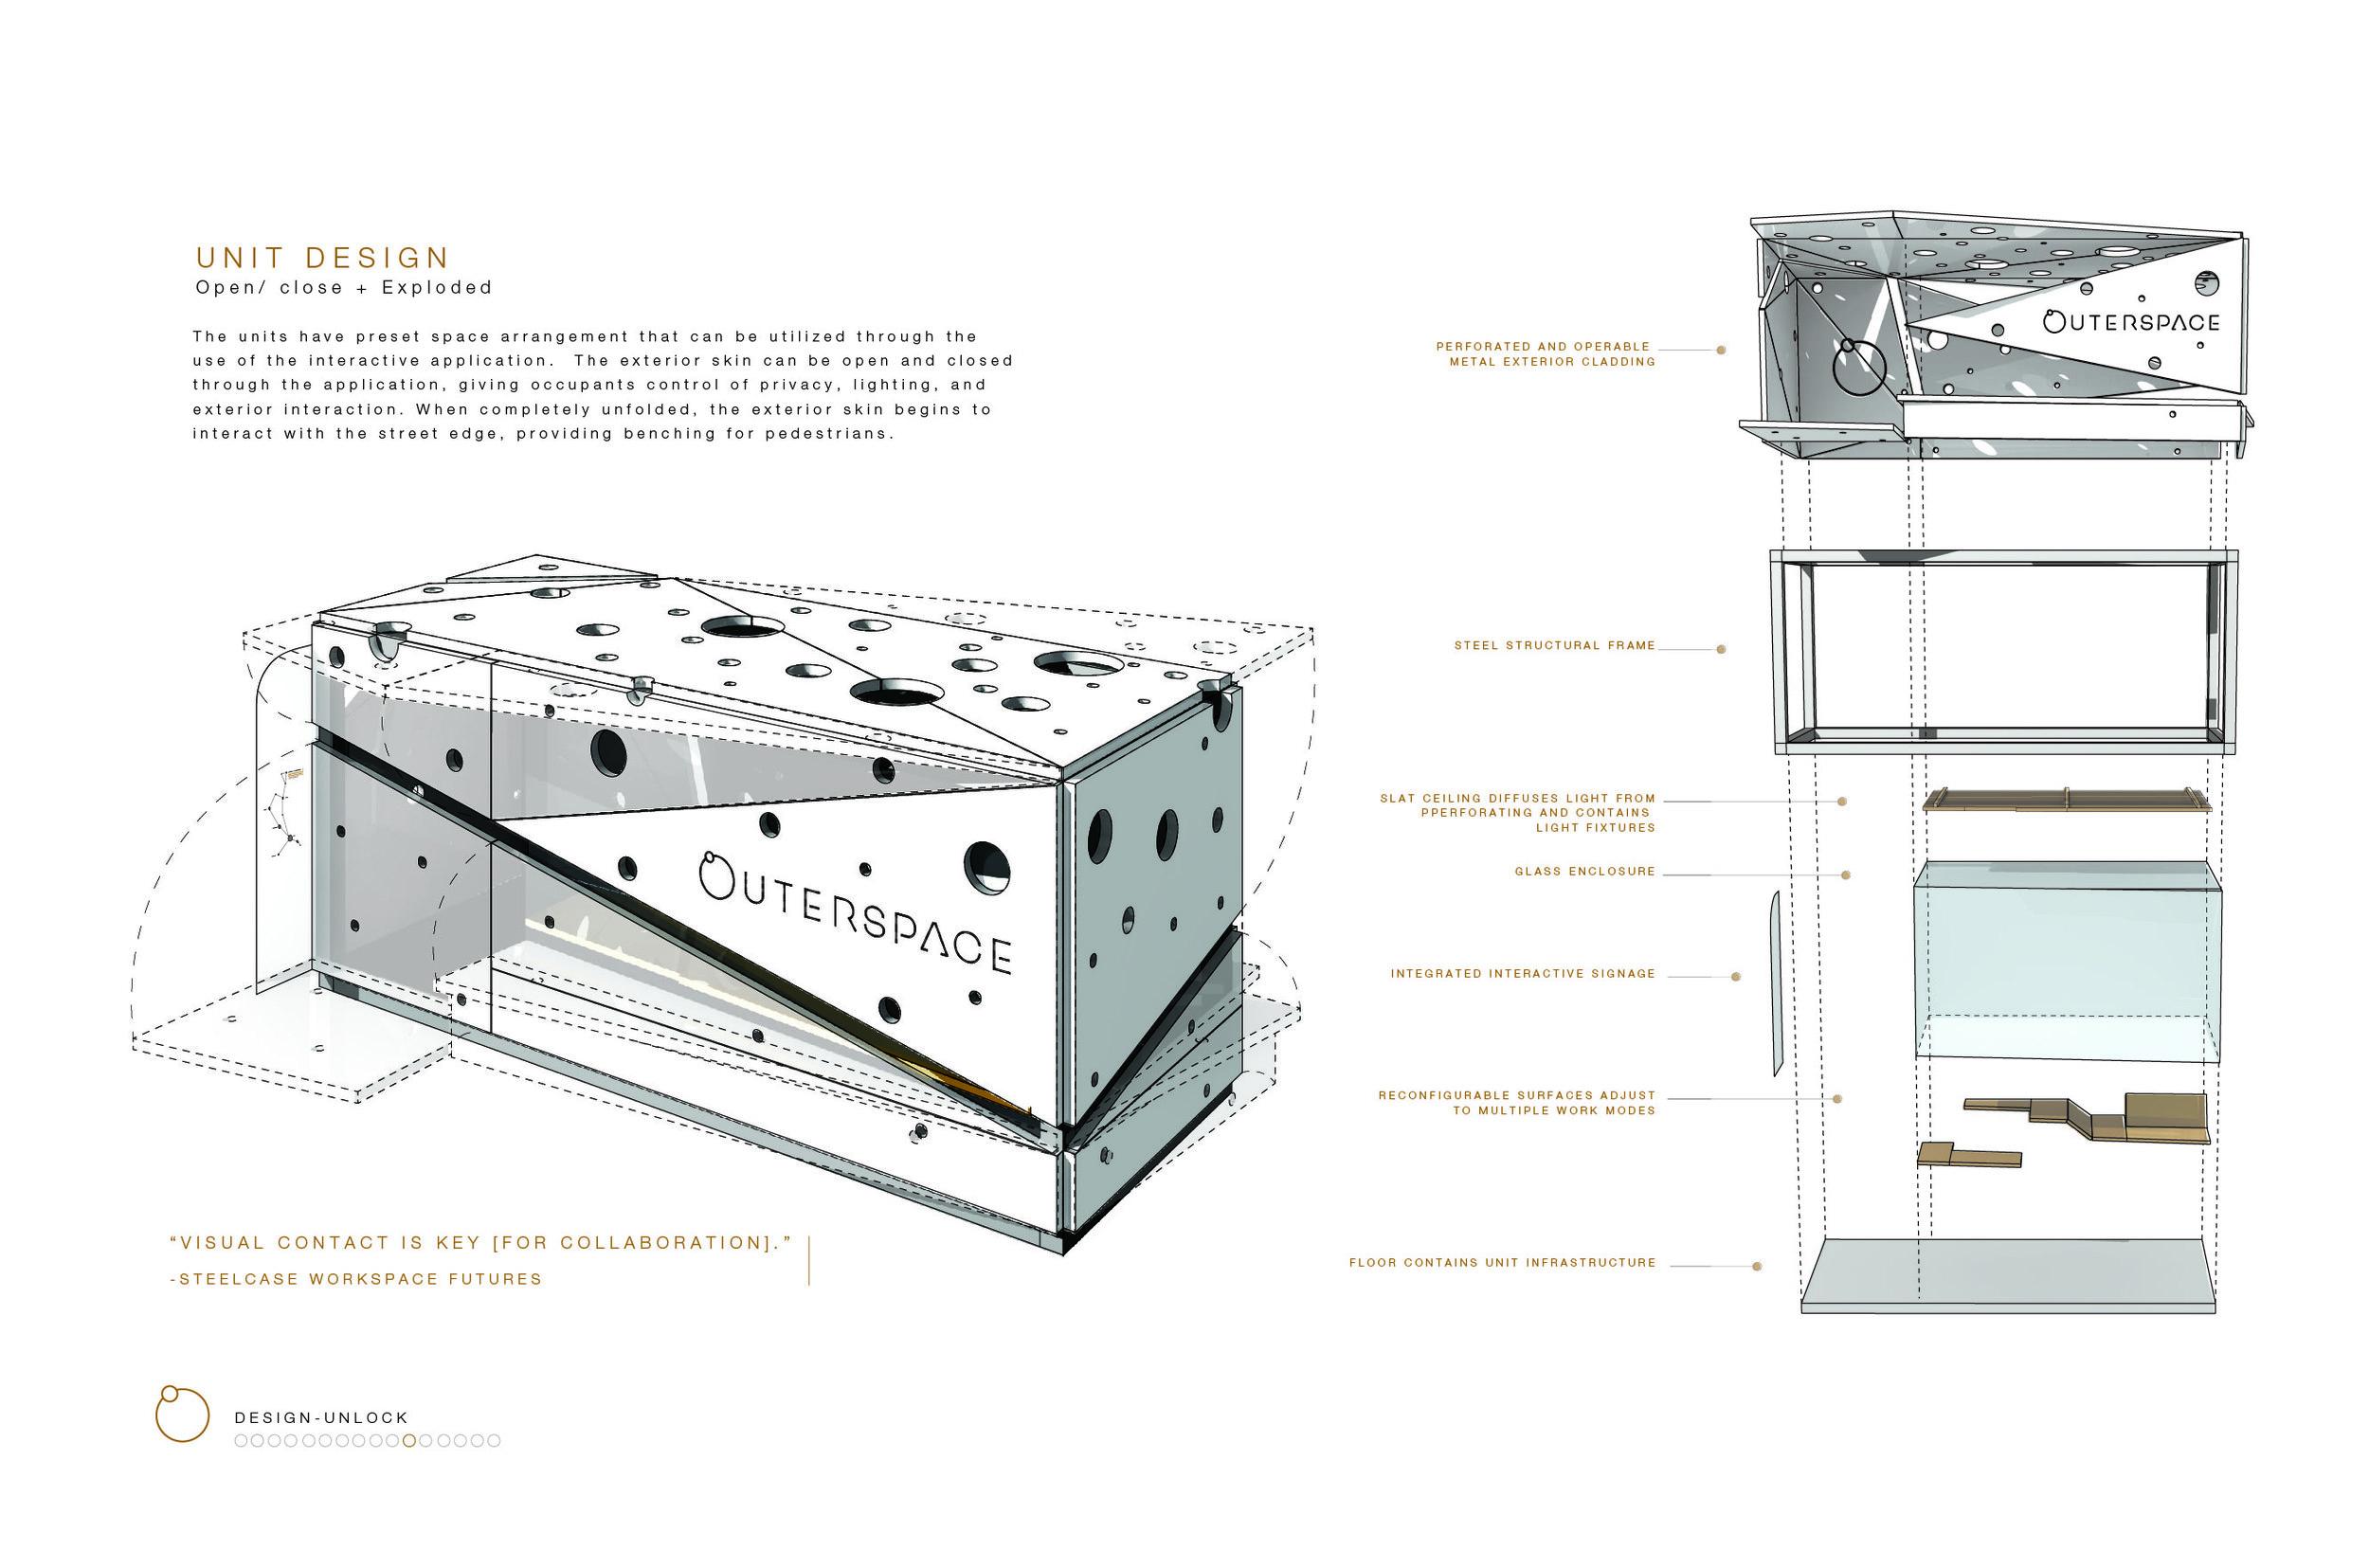 11x17_presentation-11.jpg